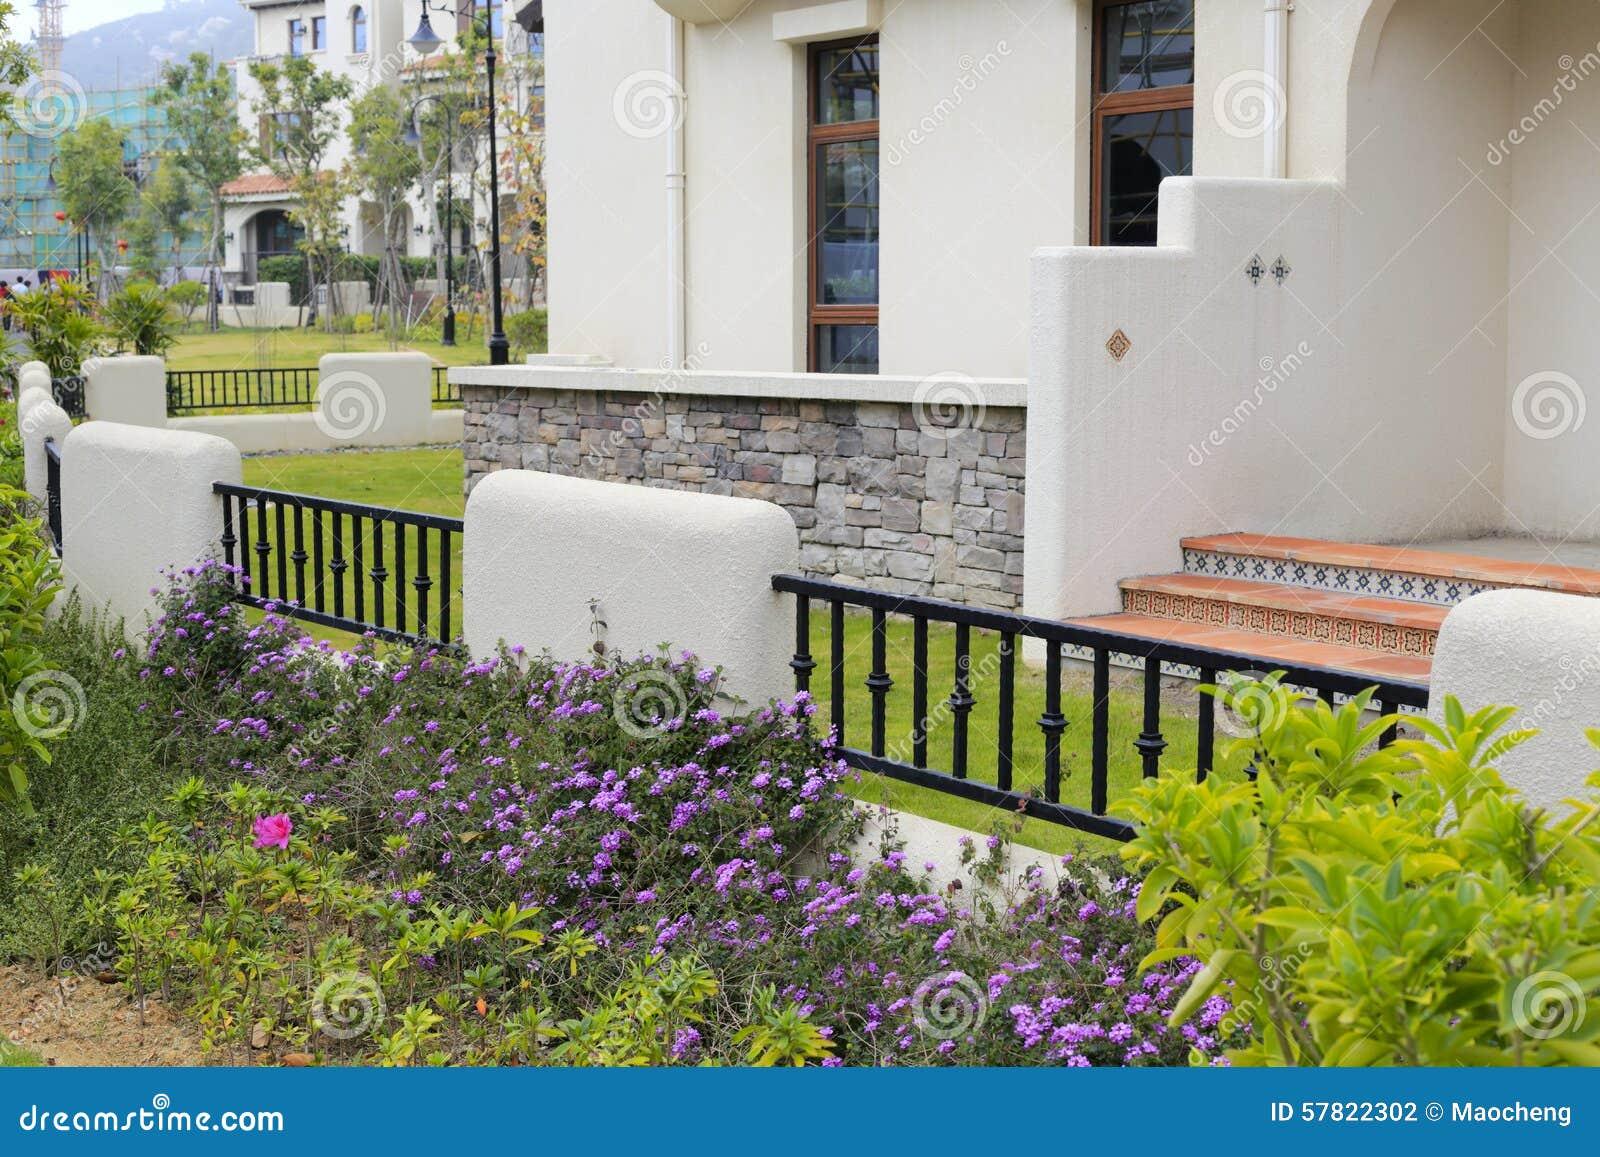 Spanish Style House Backyard